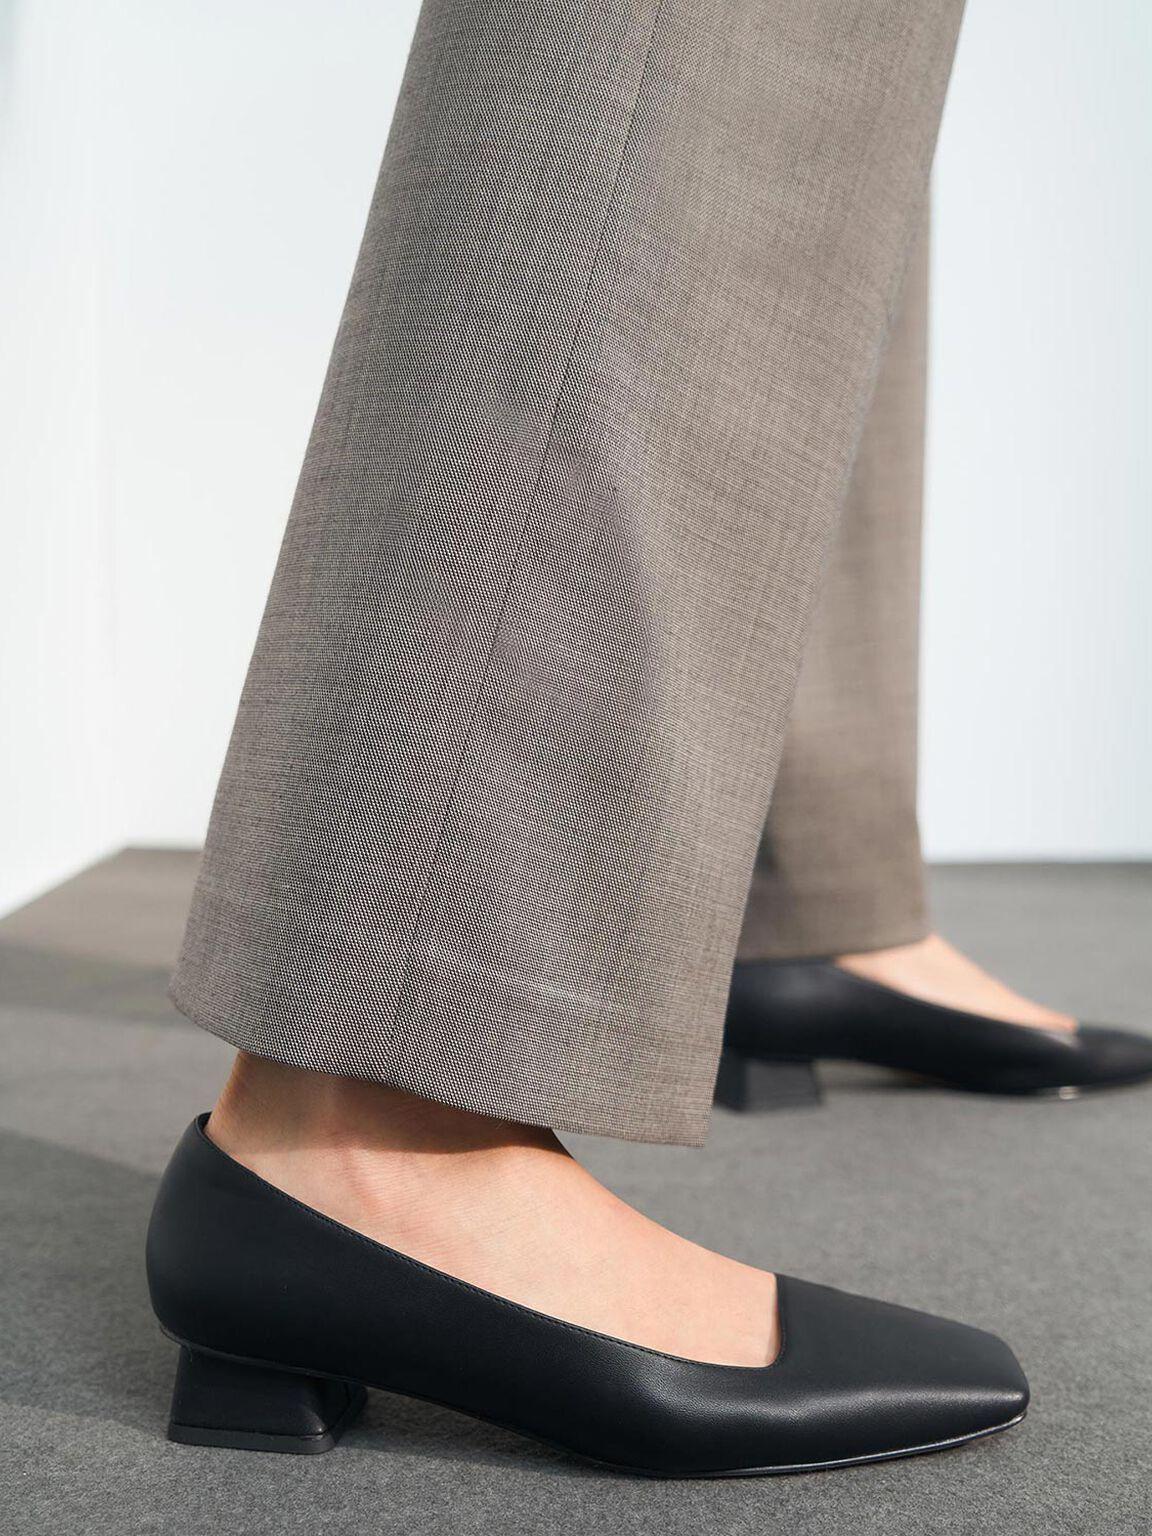 Square Toe Court Shoes, Black, hi-res